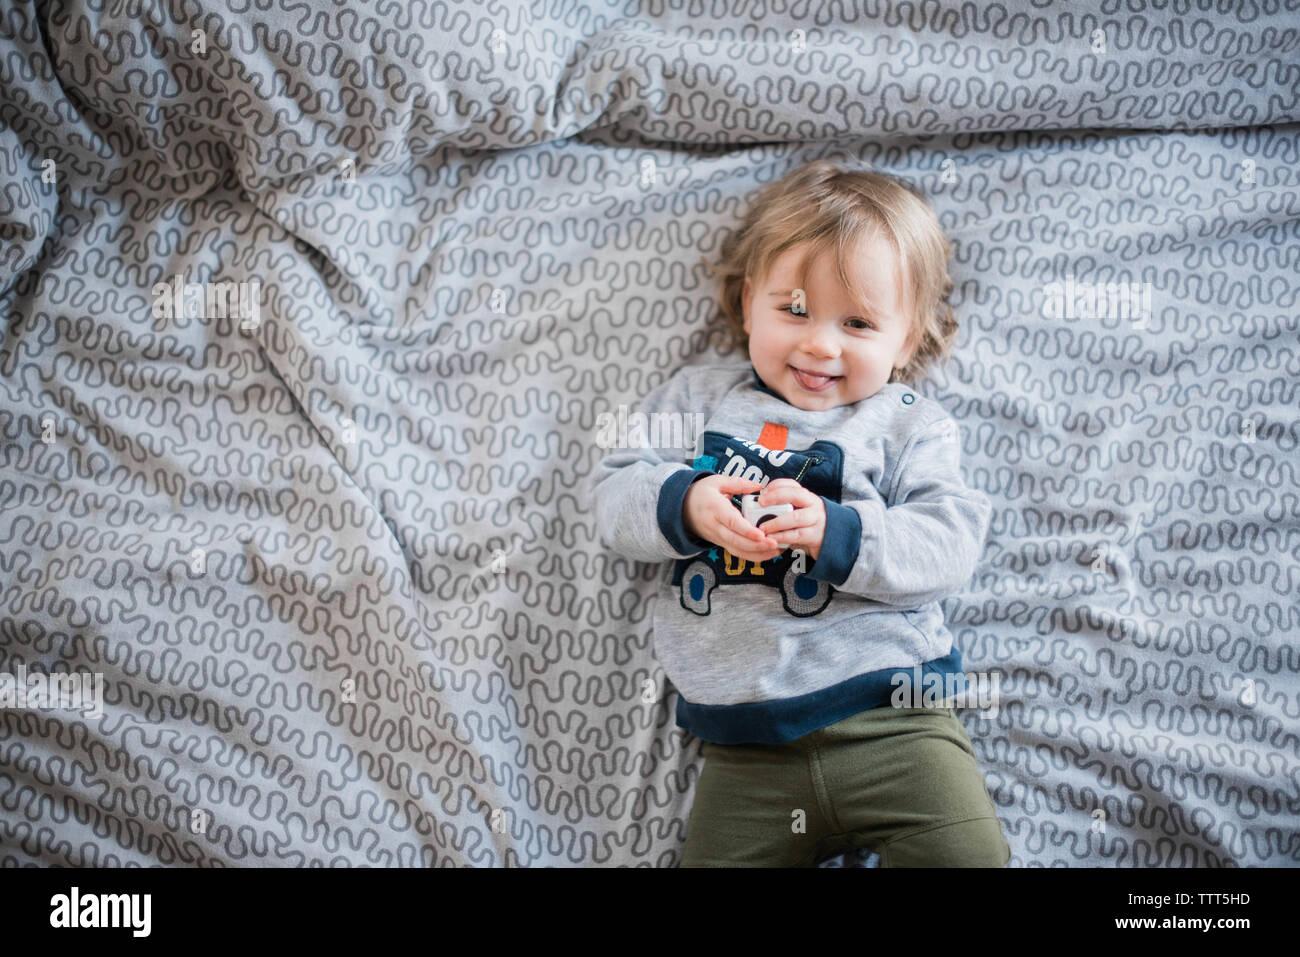 little girl cracking up. Stock Photo